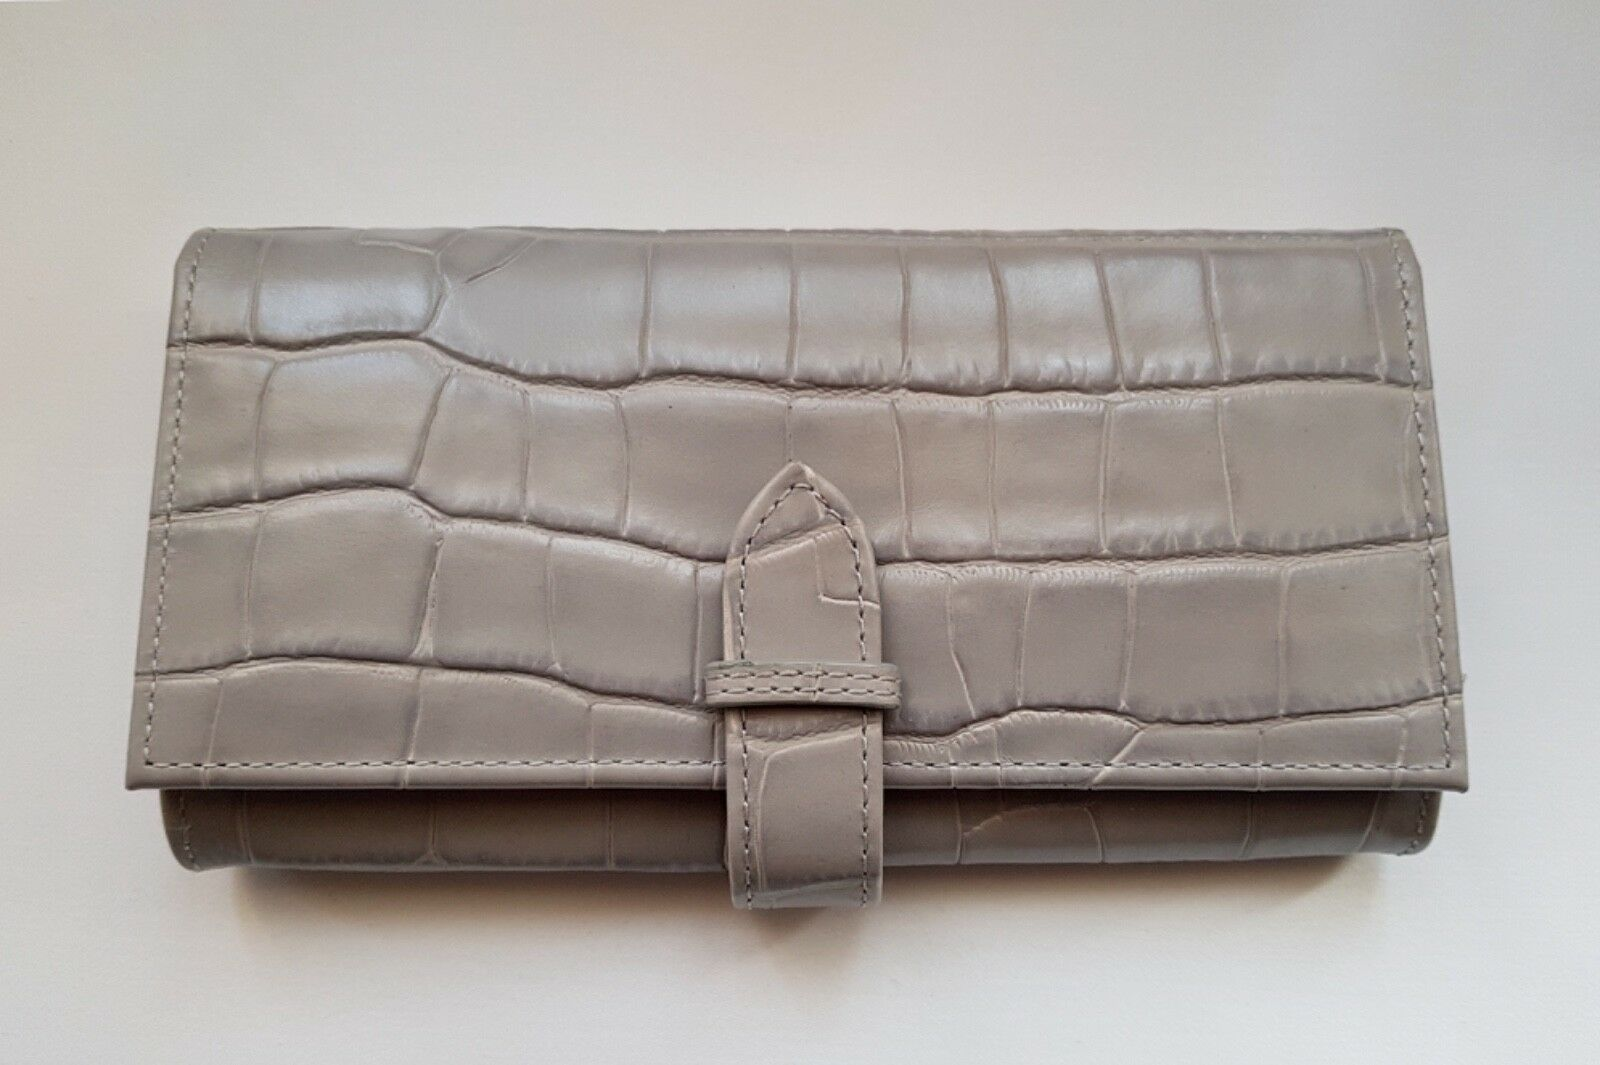 New Aspinal of London Wallet London Ladies Purse Wallet